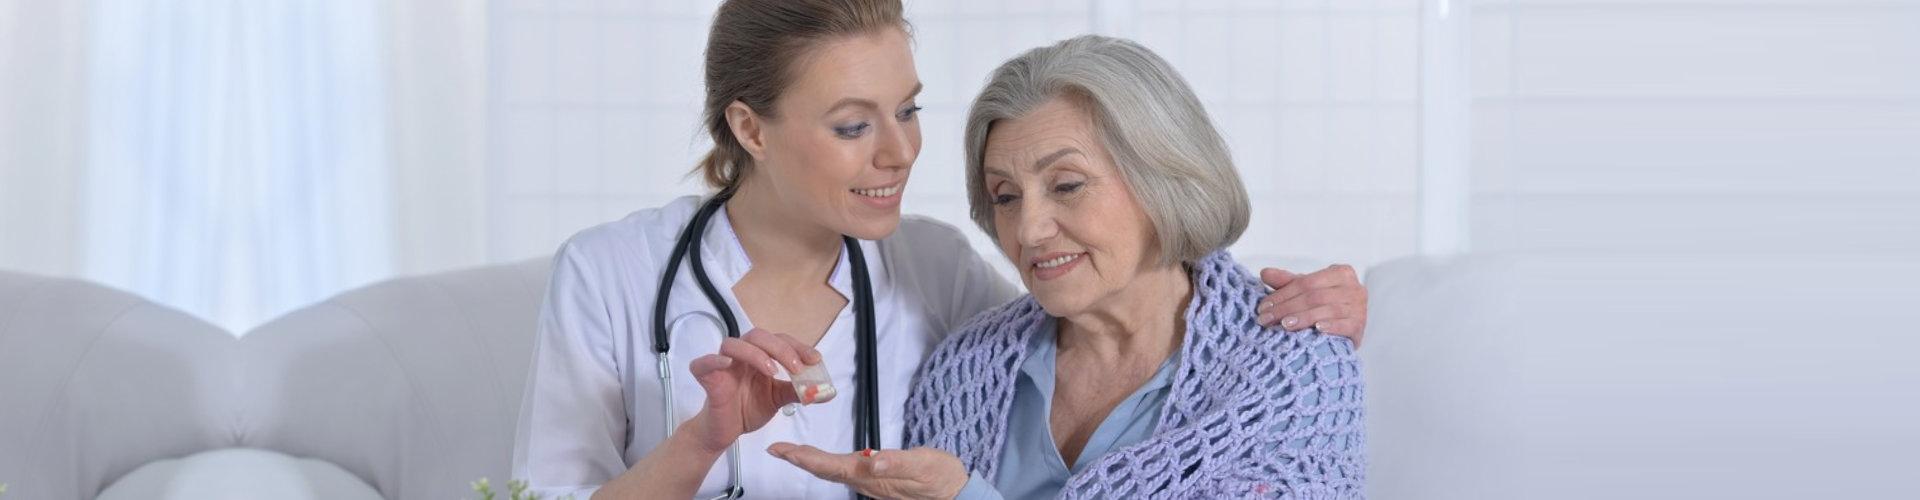 caregiver giving medicine to senior woman